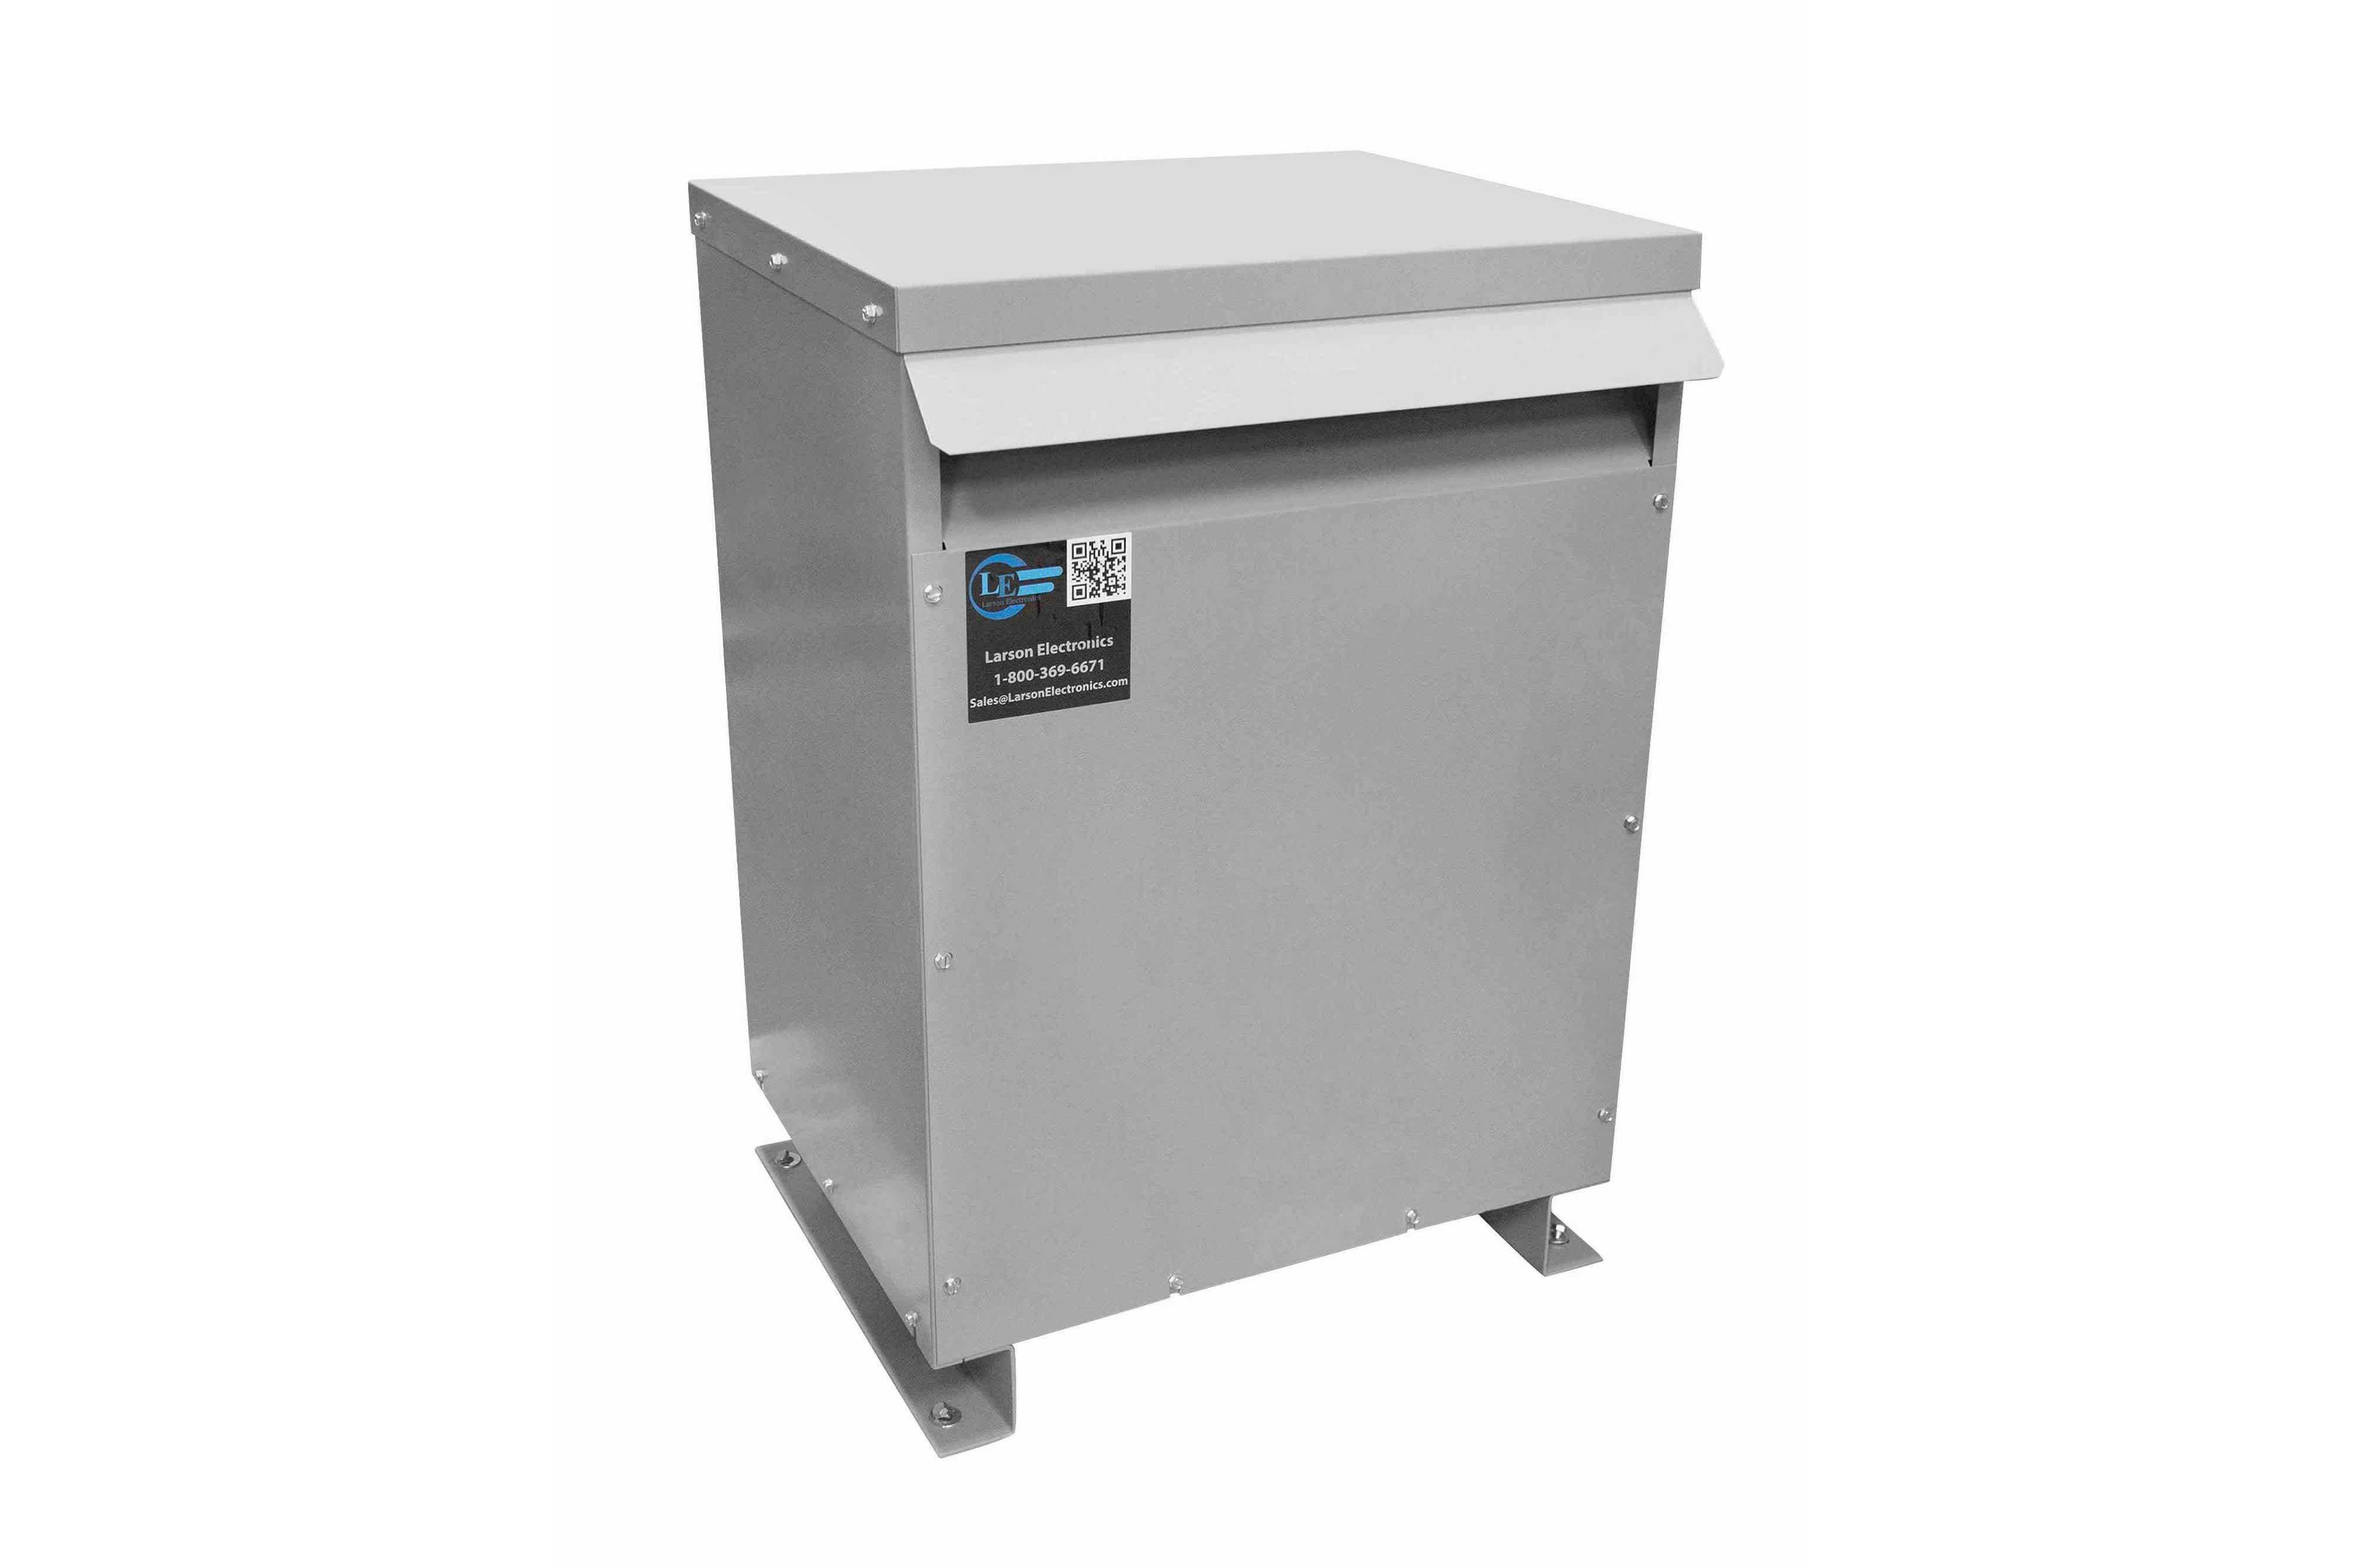 35 kVA 3PH Isolation Transformer, 208V Wye Primary, 208Y/120 Wye-N Secondary, N3R, Ventilated, 60 Hz